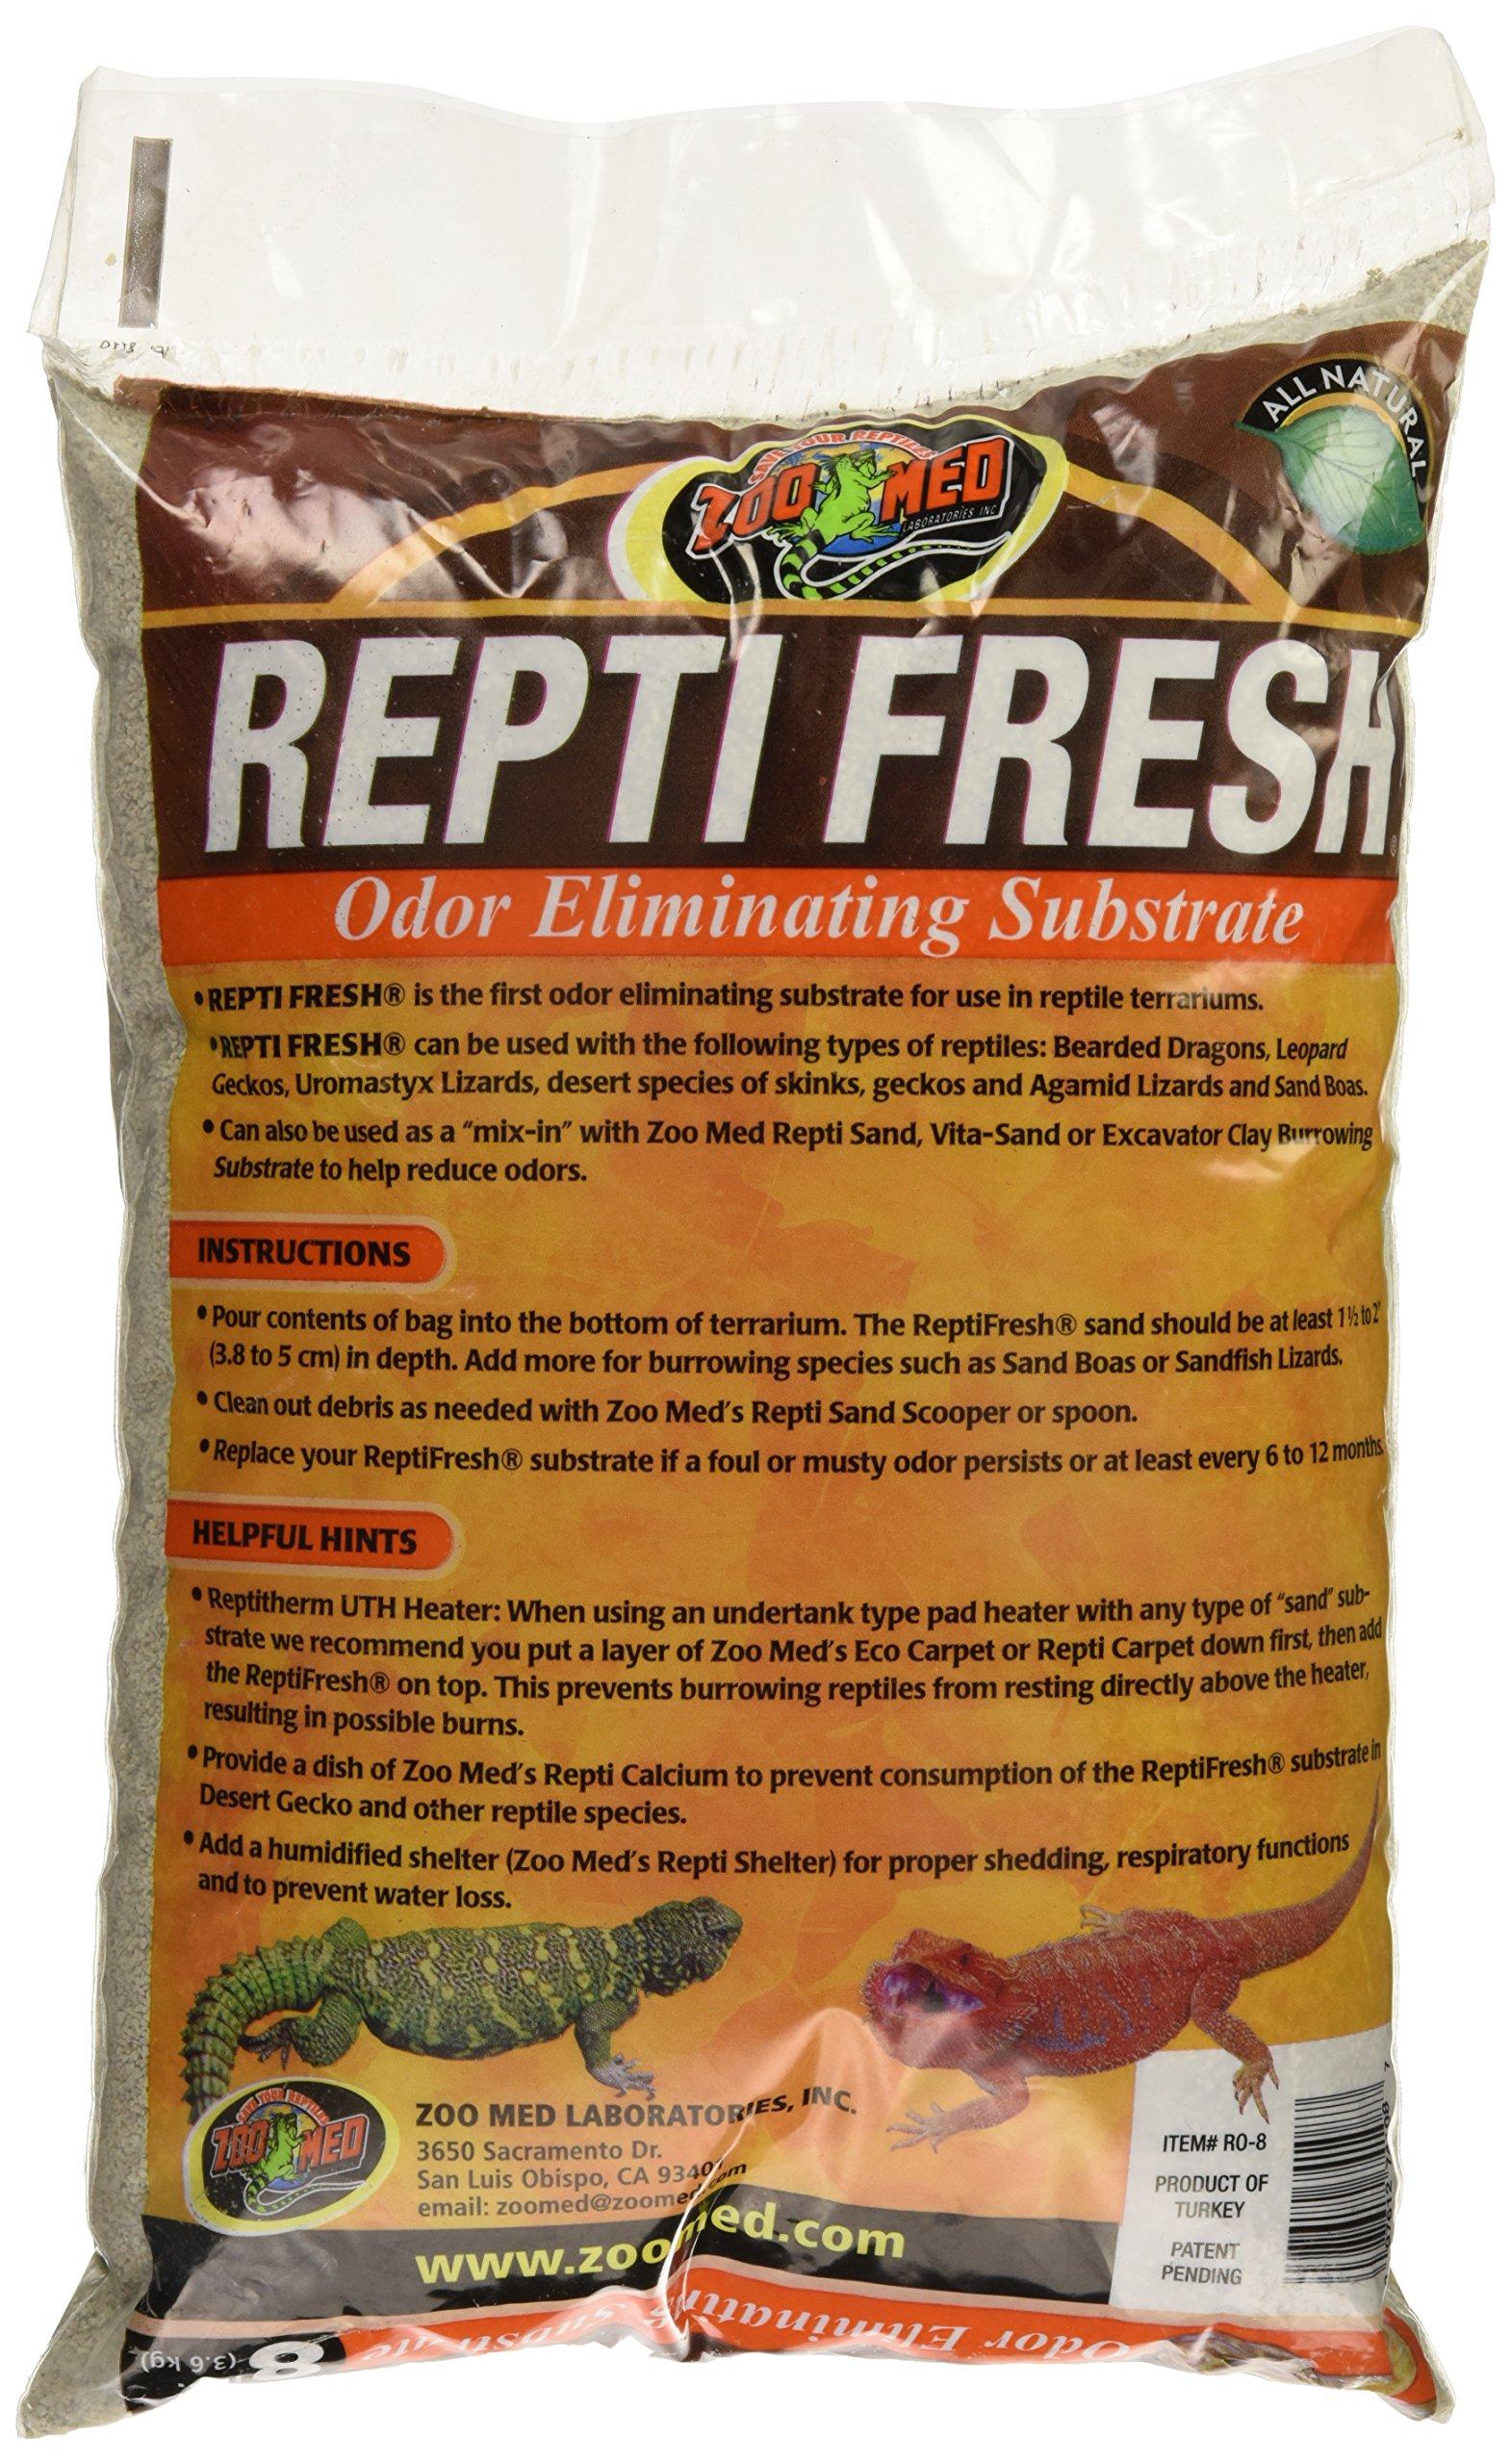 Zoo Med ReptiFresh Odor Eliminating Substrate, Blacks & Grays, 8 lb